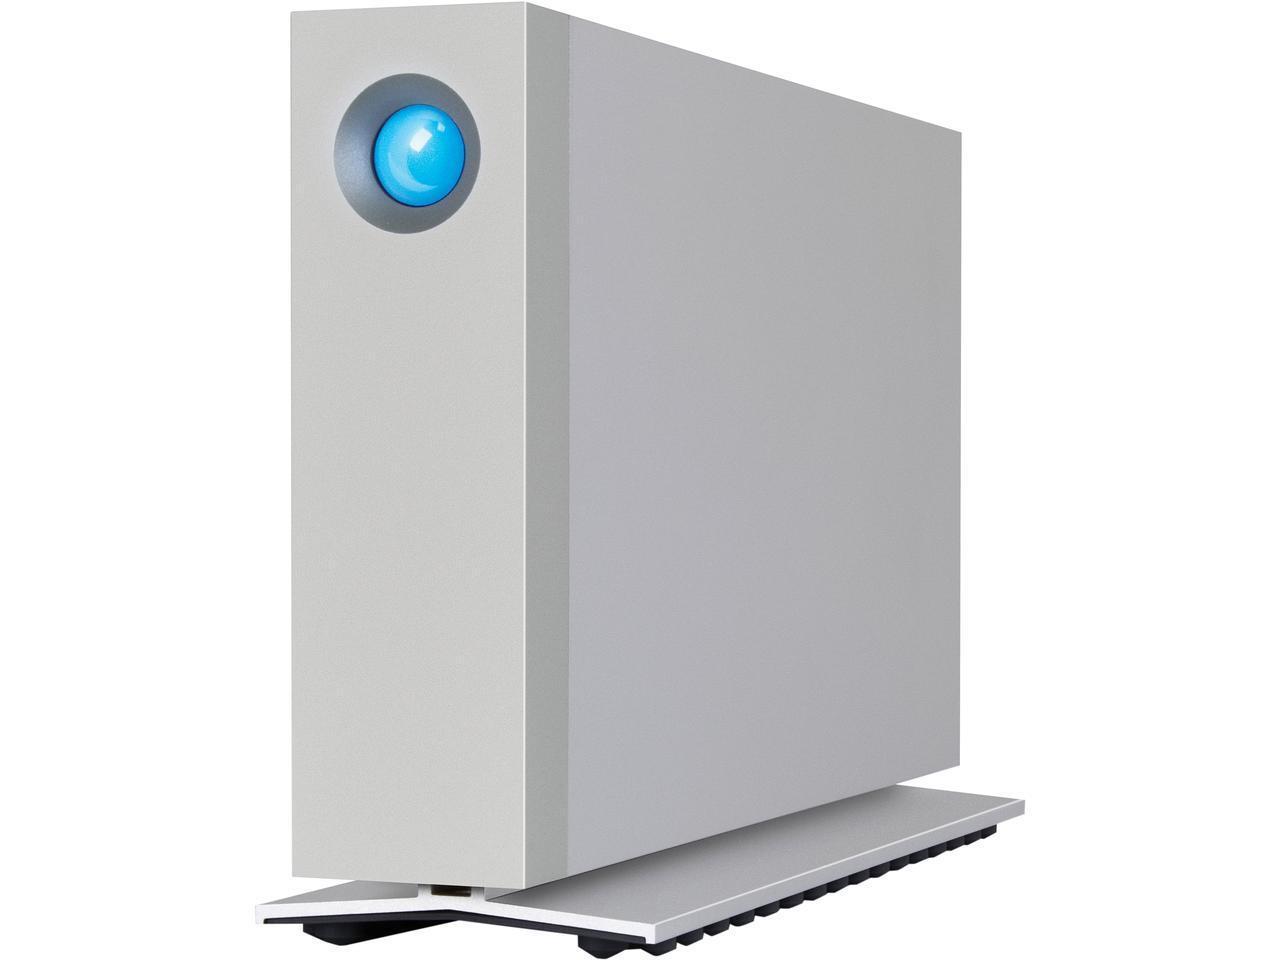 LaCie d2 Thunderbolt 3, 10TB USB 3.1 External Hard Drive STFY10000400 / 단골등록 할인혜택 : 토로스몰